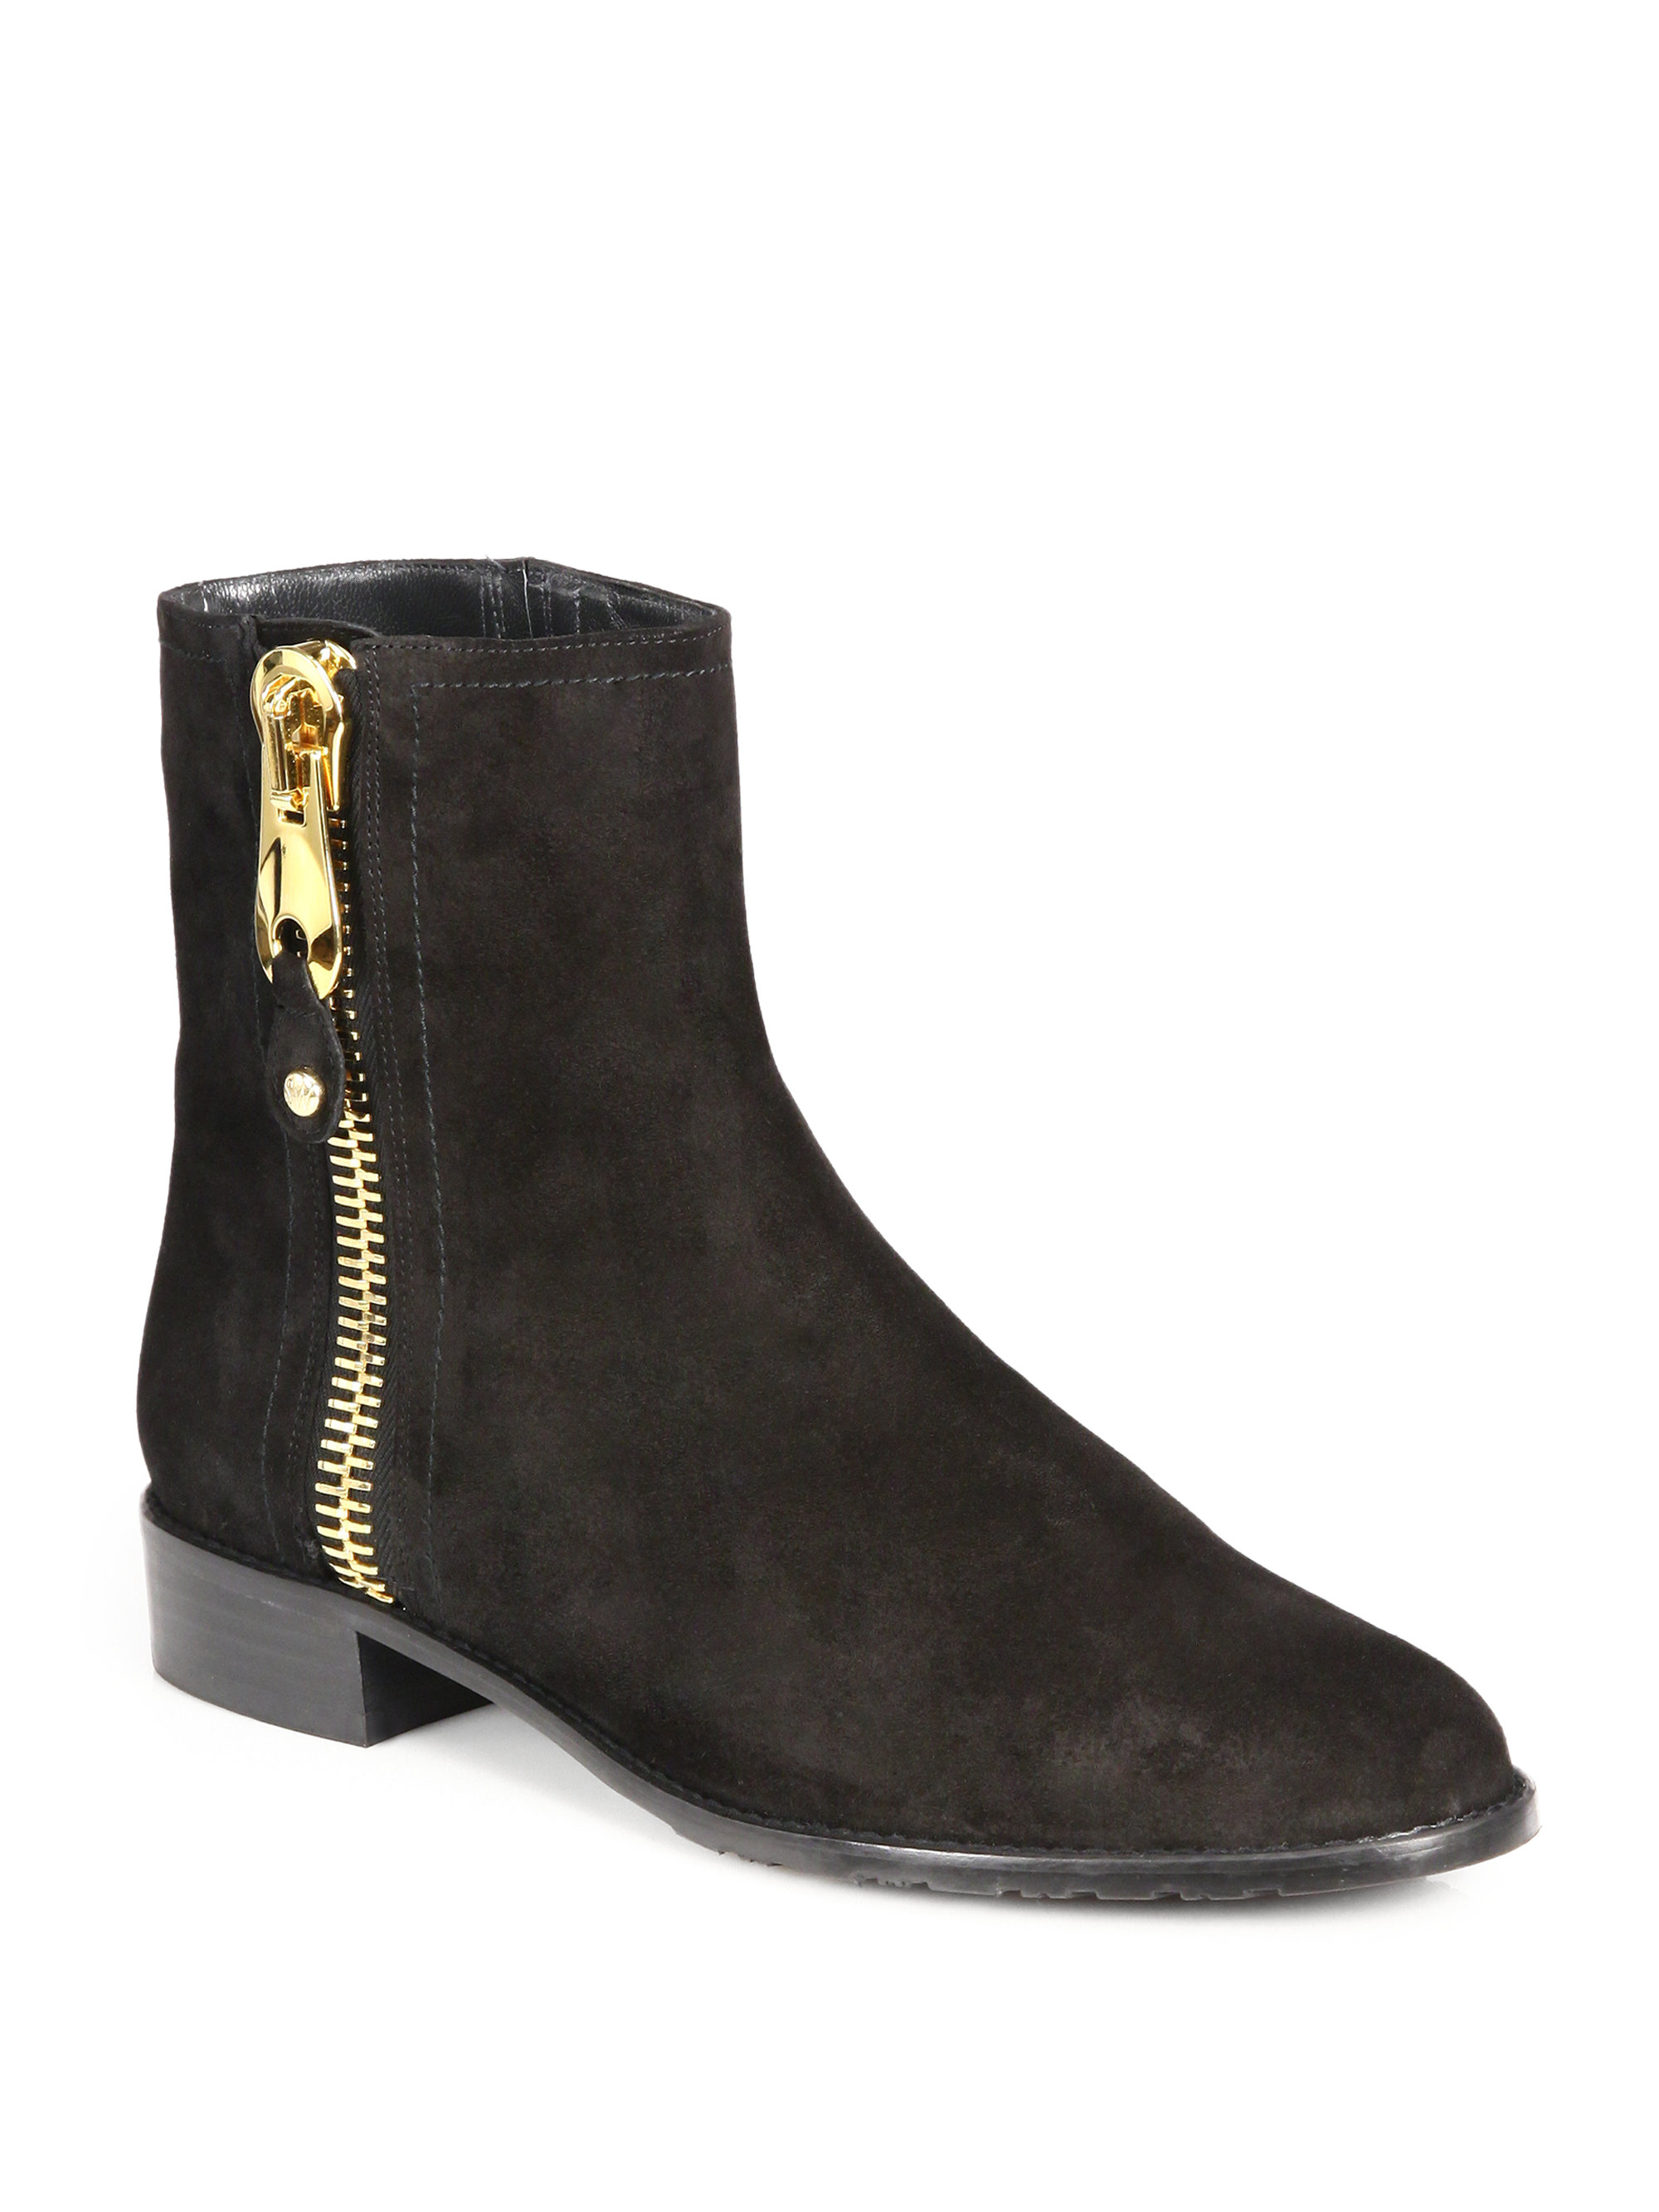 Stuart Weitzman Suede Zipper Ankle Boots In Black Lyst